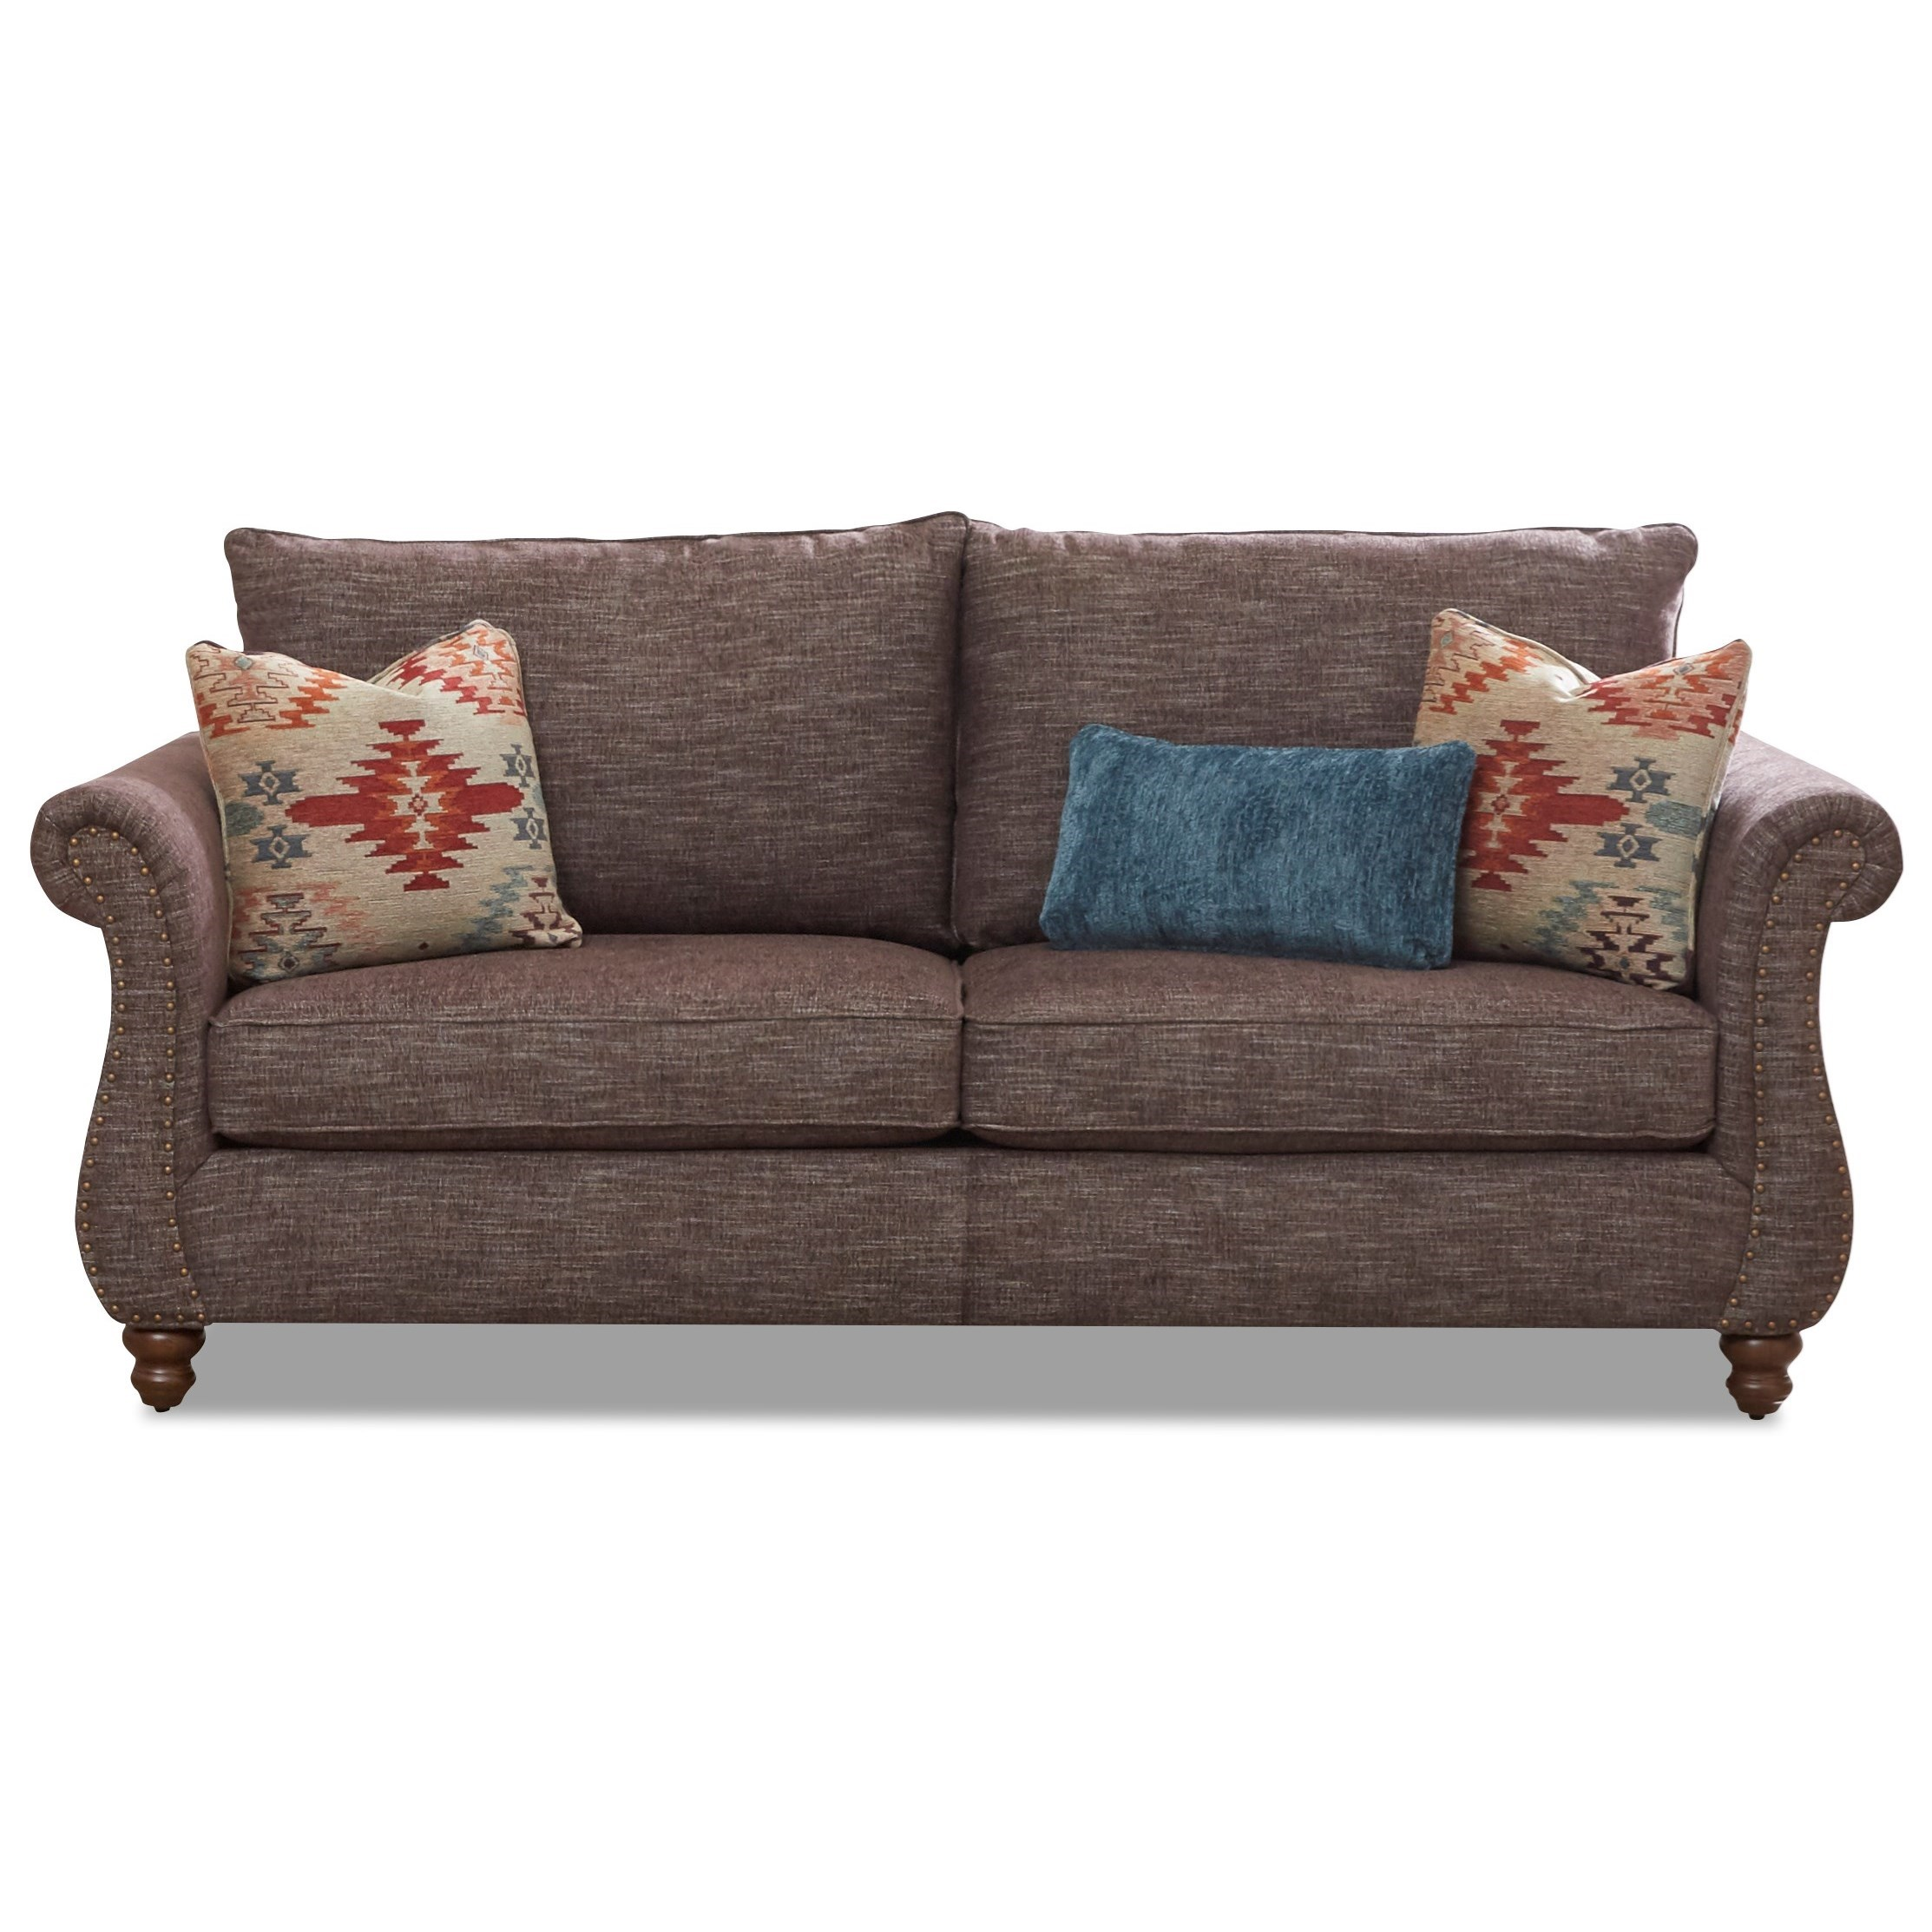 Sofa with Nailhead Trim & Kool Gel Cushions